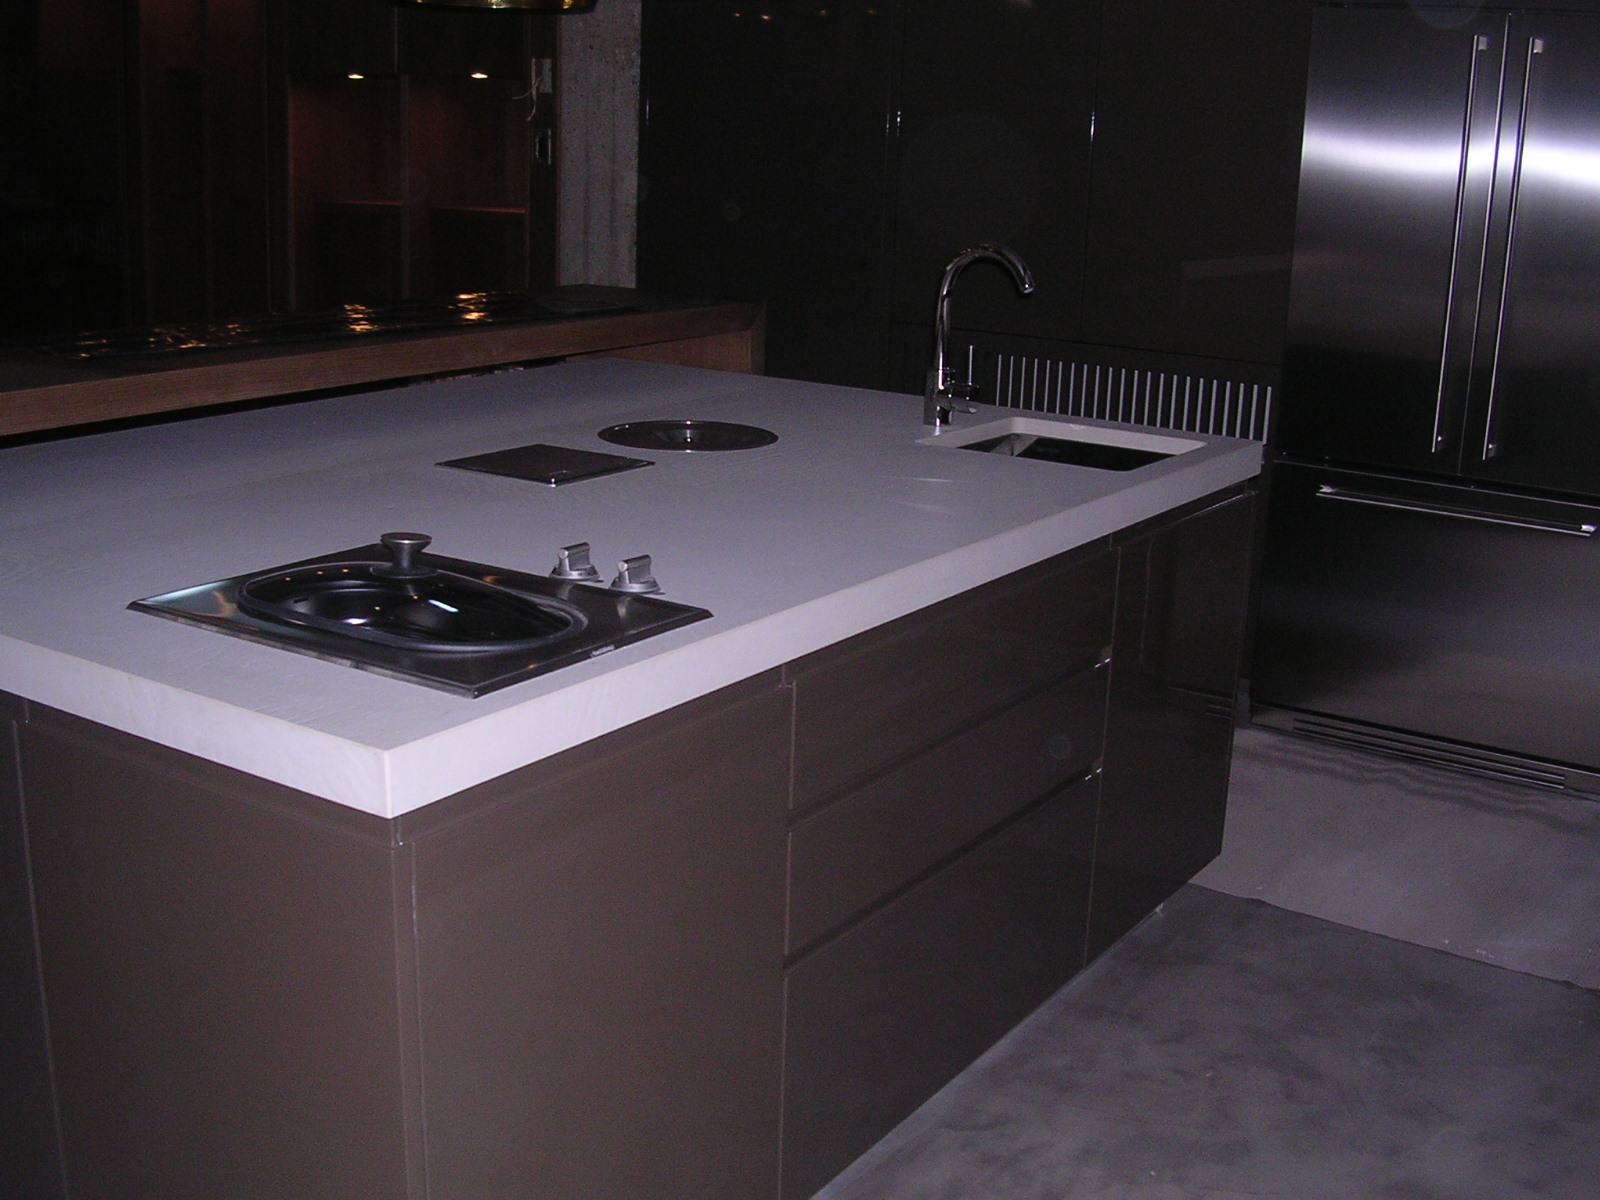 Mobili fai da te cucina - Verniciare mobili cucina fai da te ...